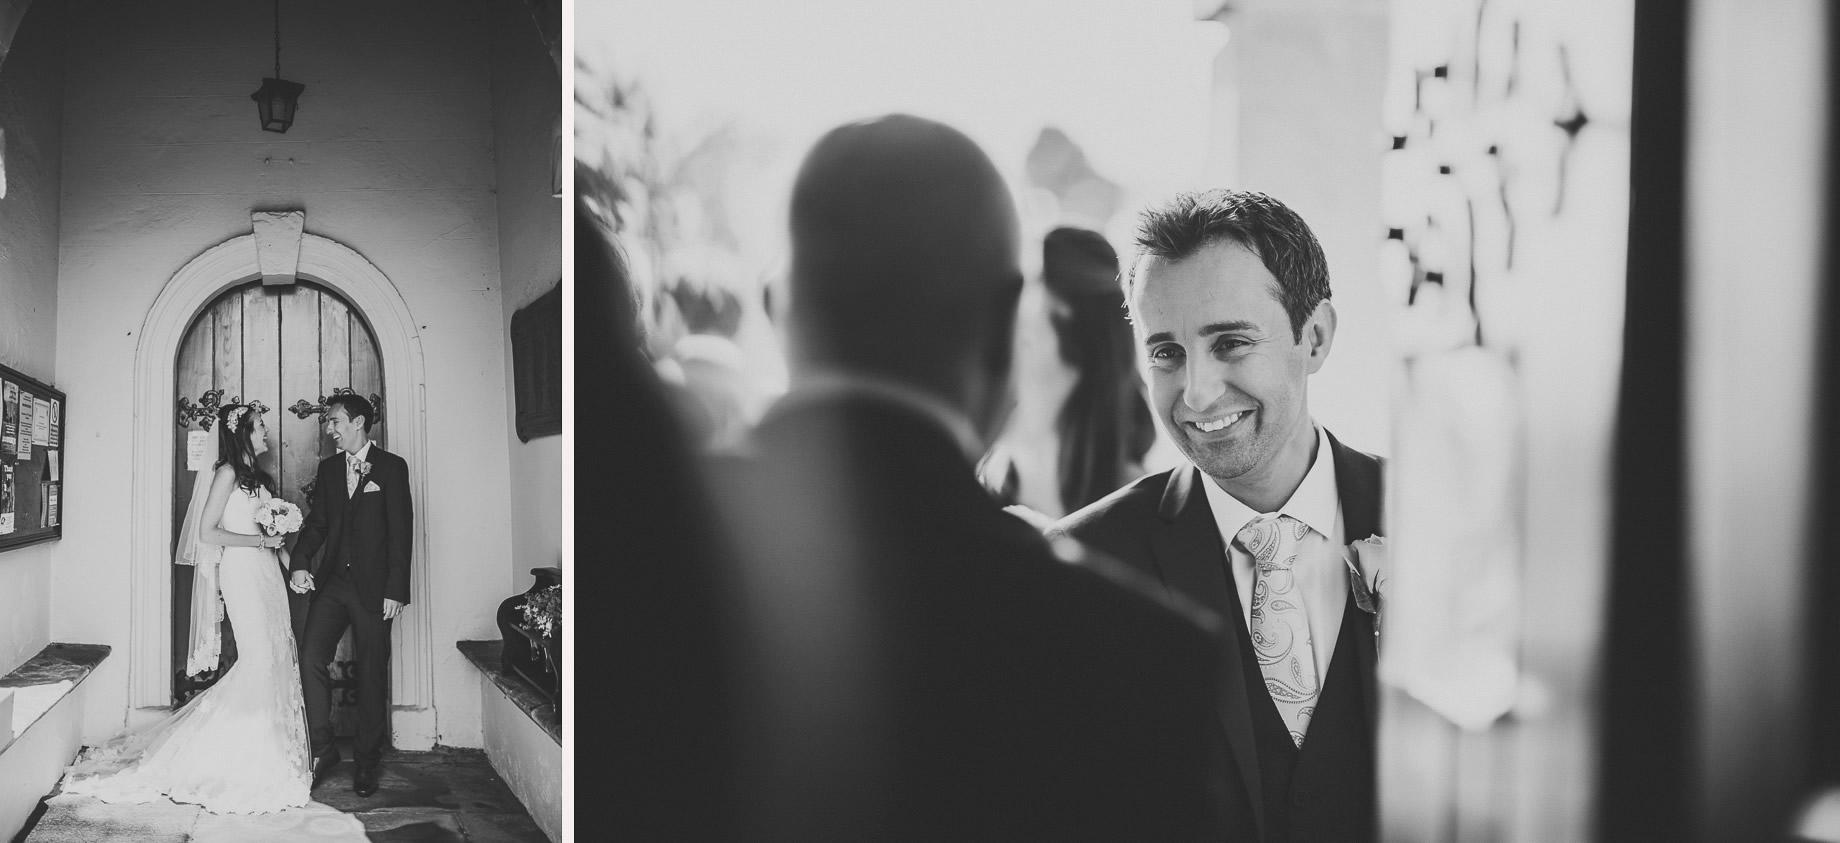 Helen and Matt's Wedding at Mitton Hall 048